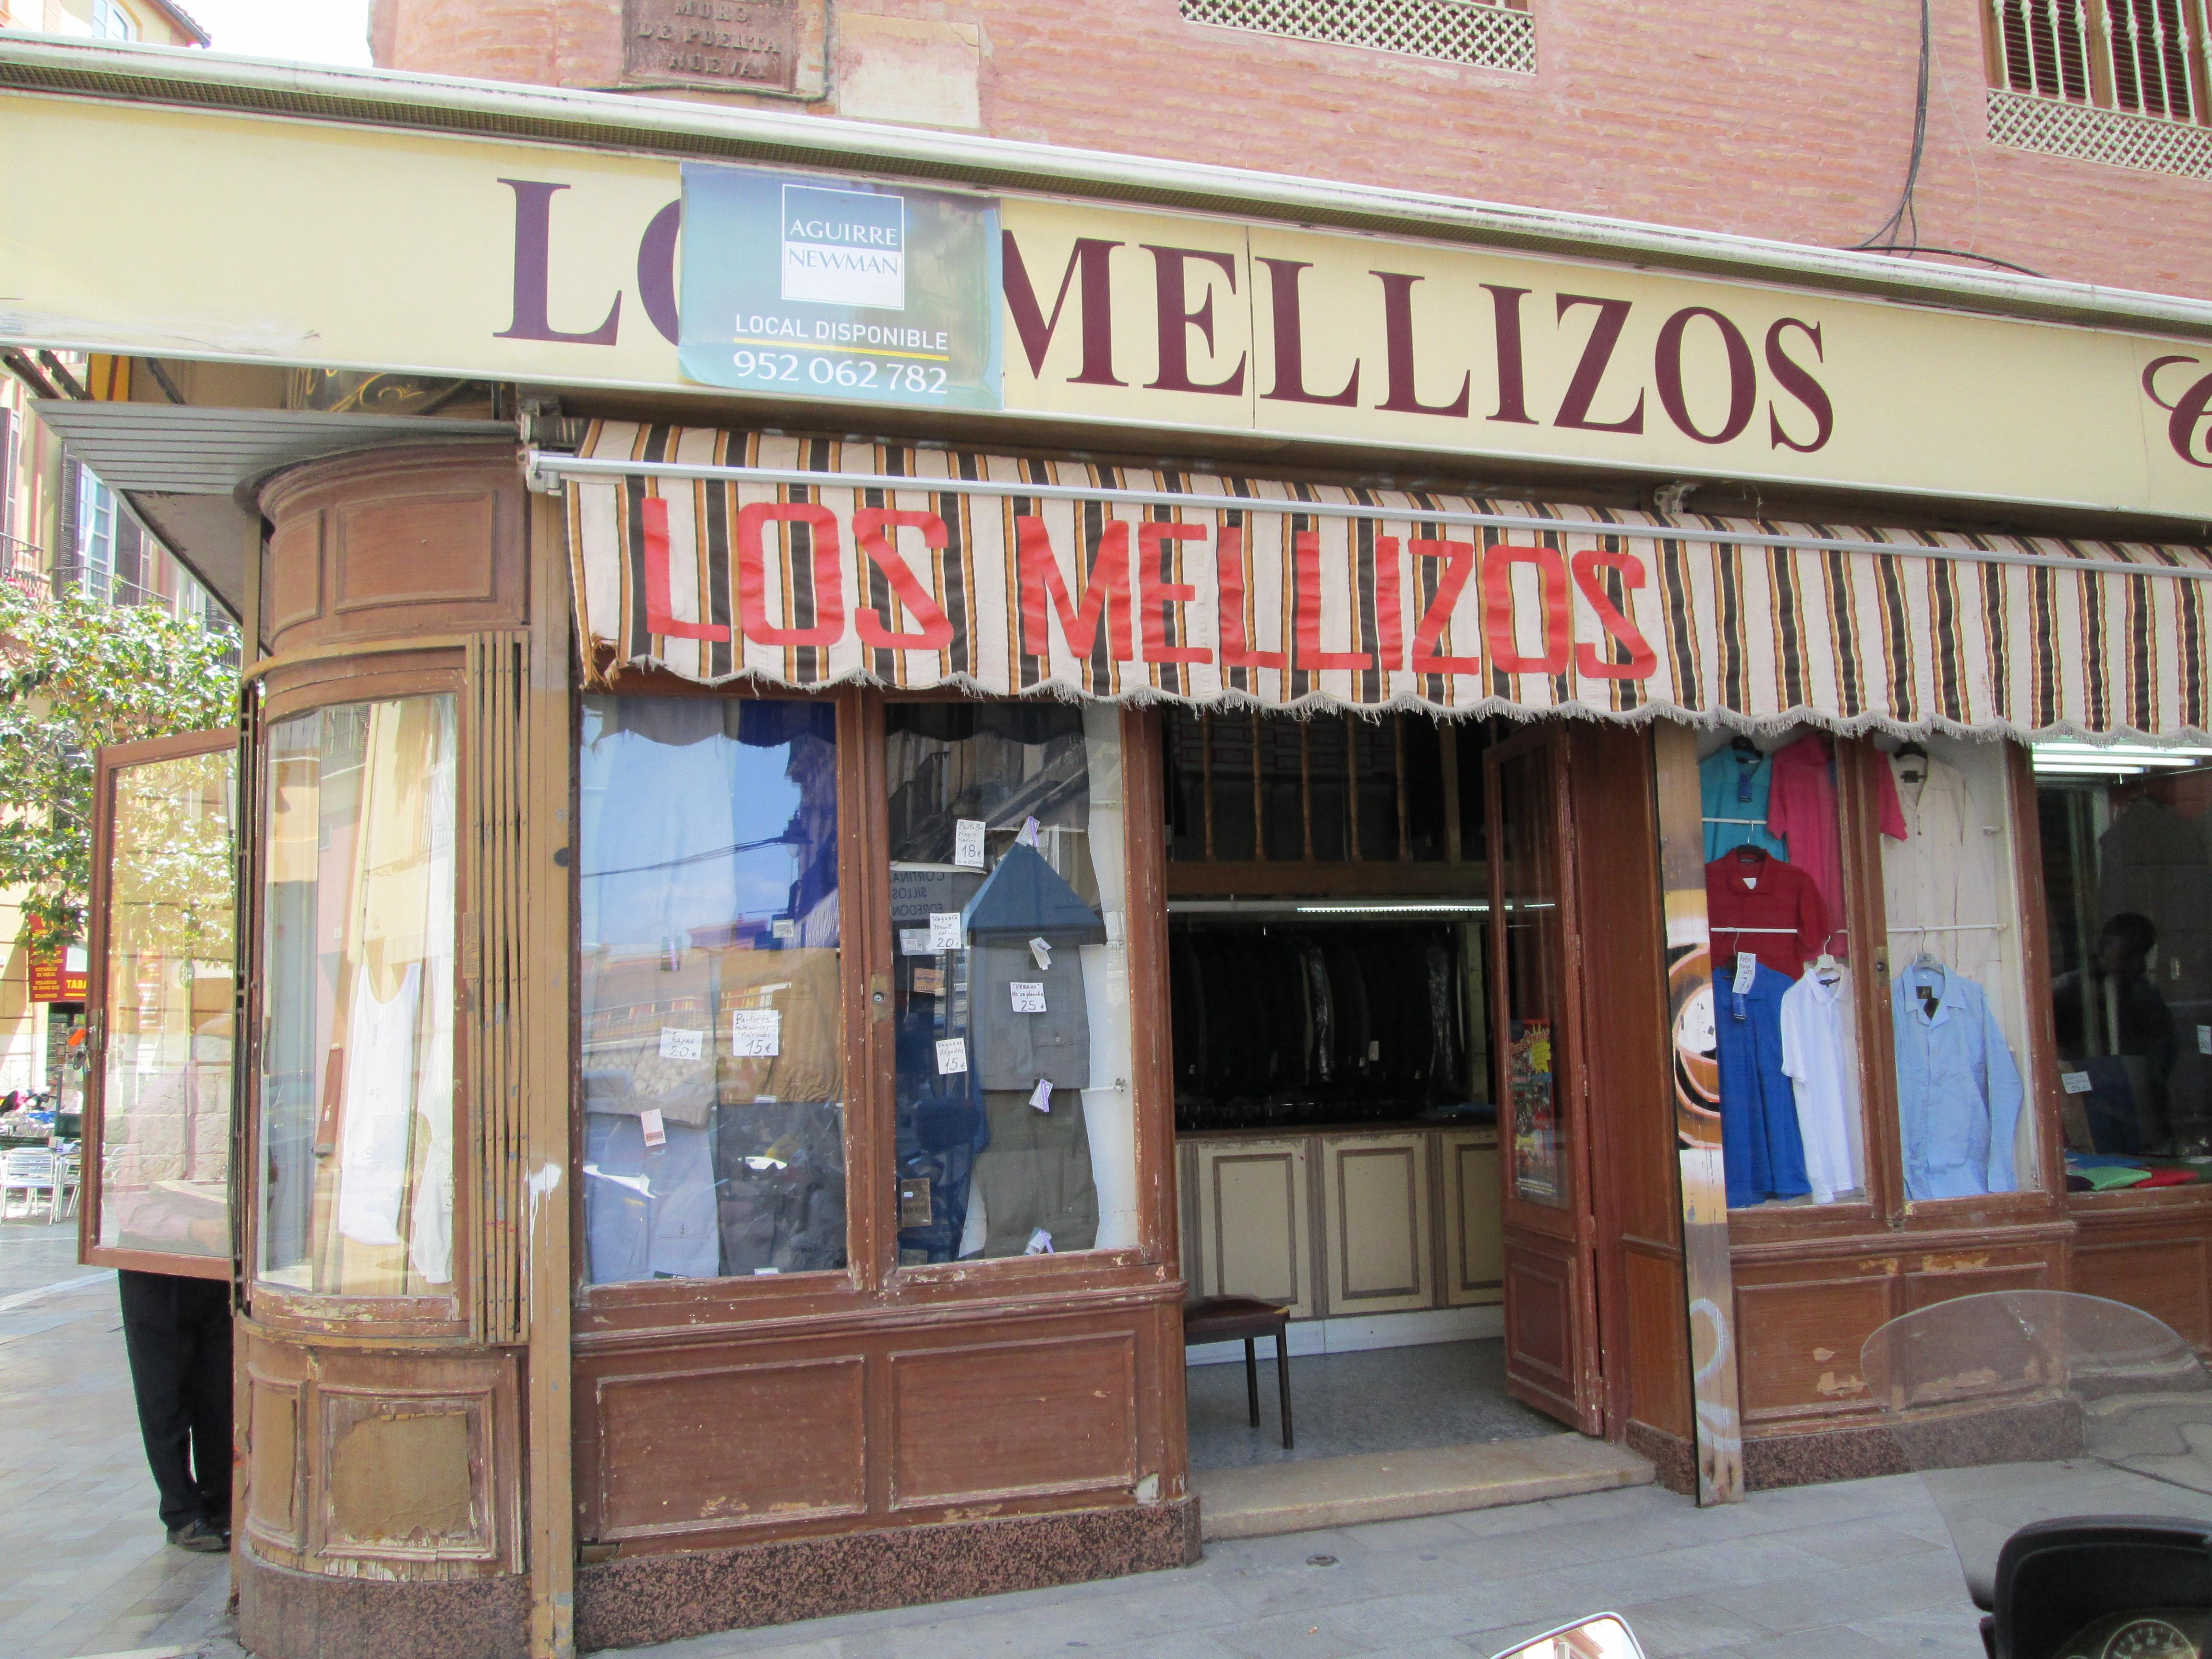 File shop los mellizos m wikimedia commons - Los mellizos malaga ...